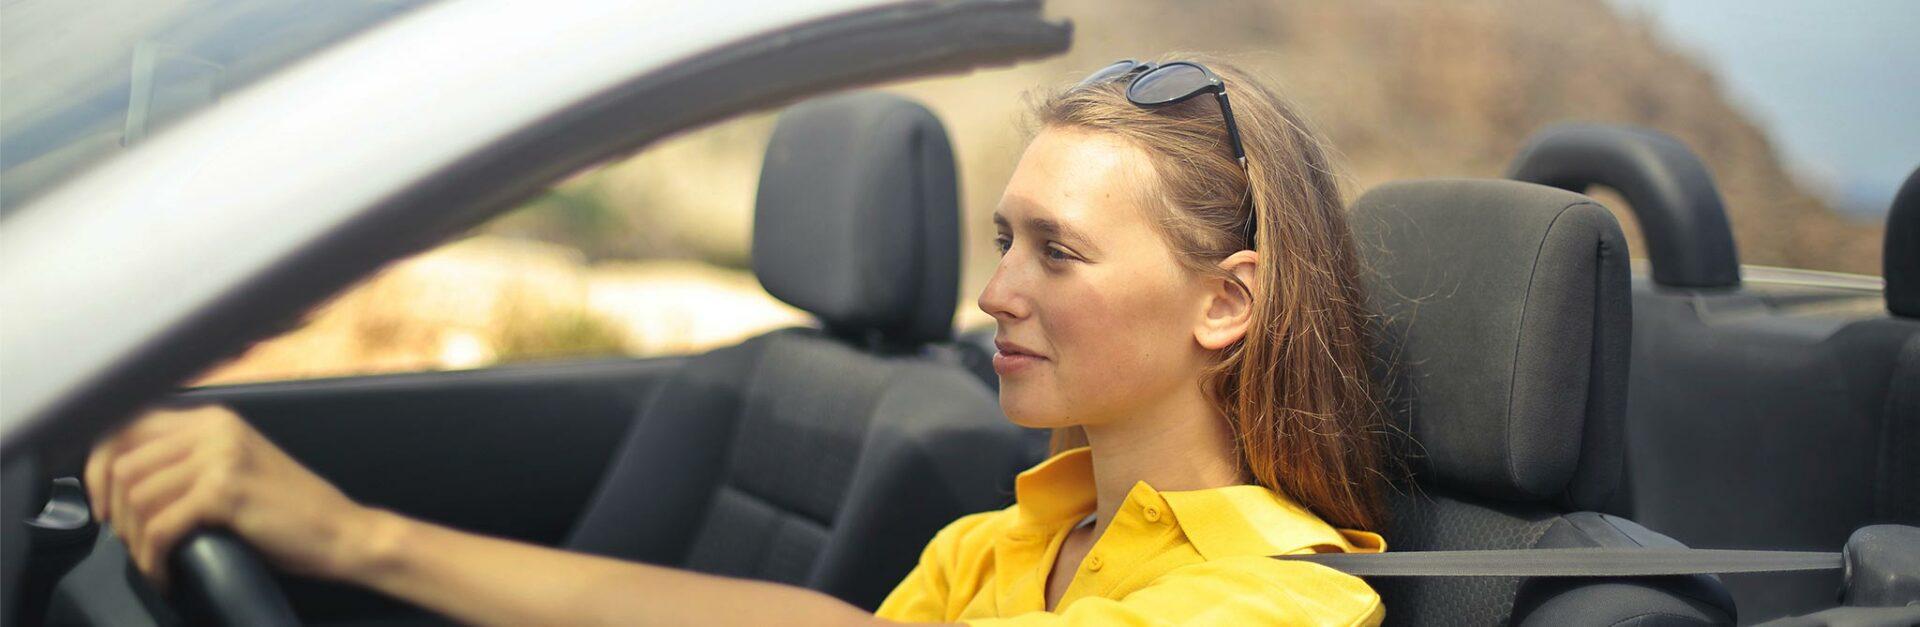 woman driving convertible car